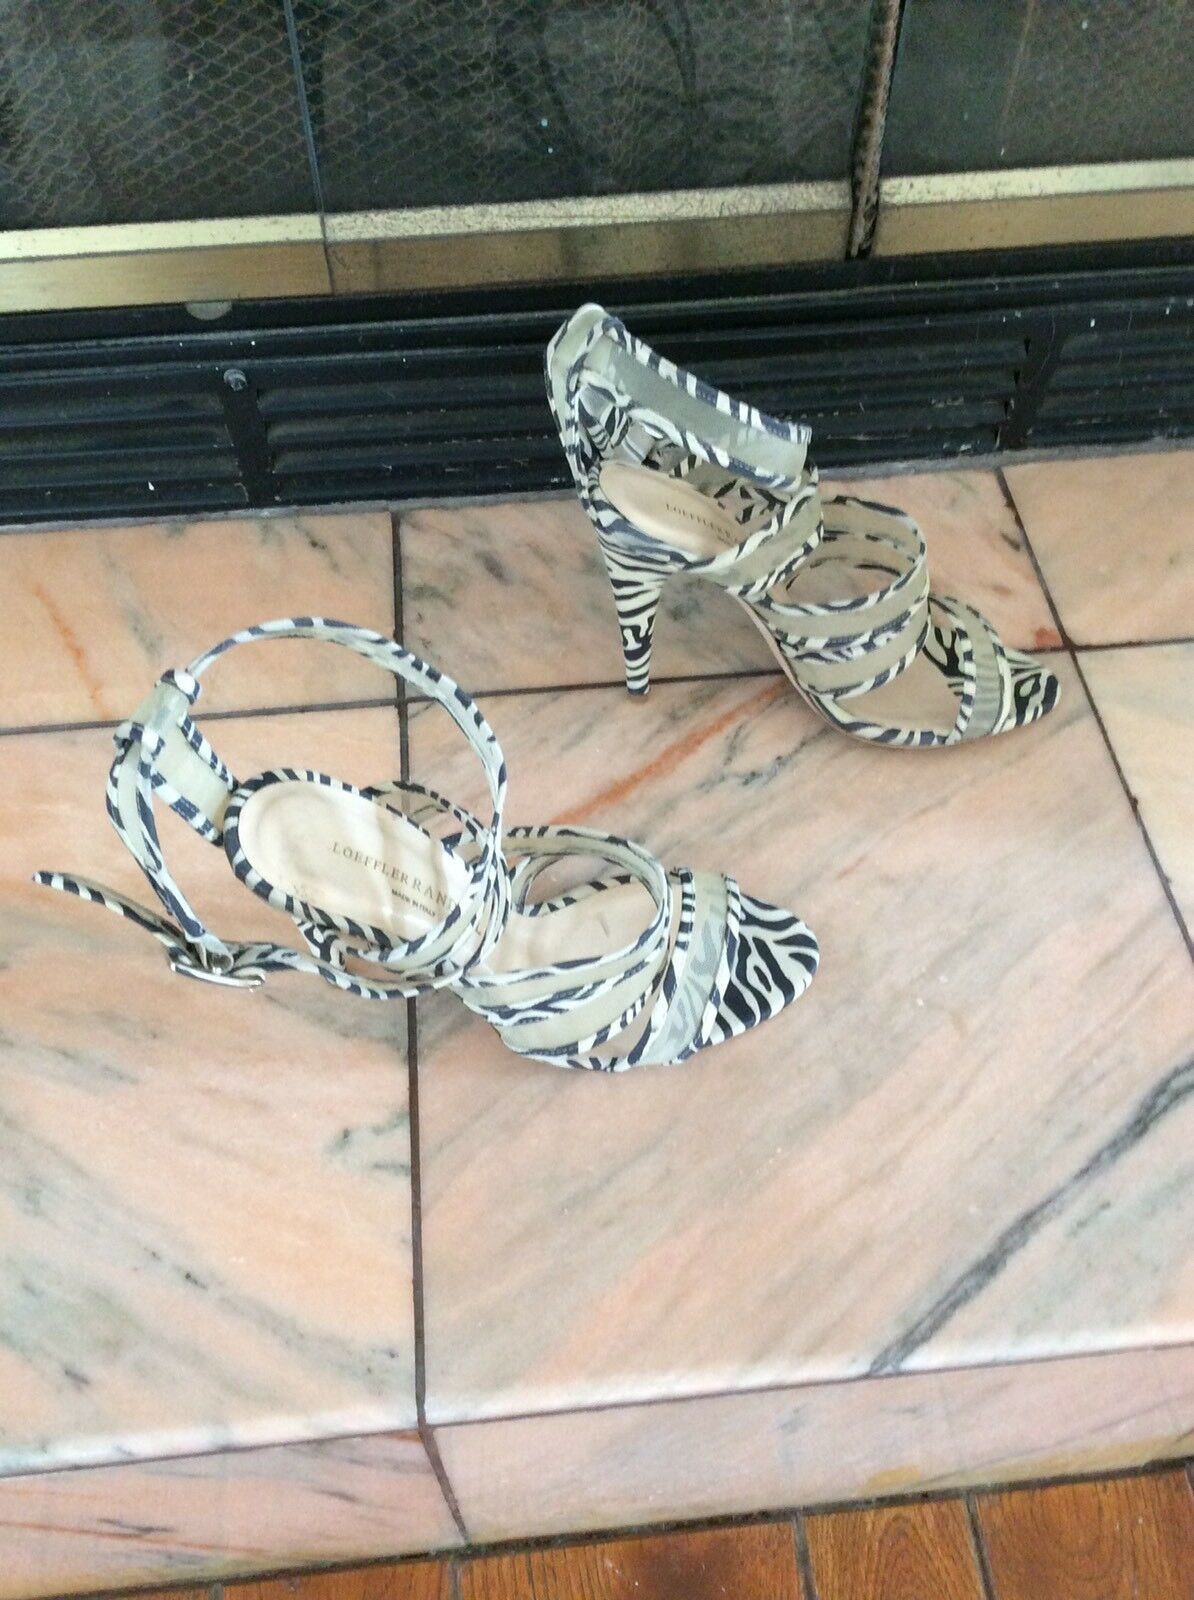 Loeffler Randall Scrappy Scrappy Scrappy Sandals Size 8B f47884